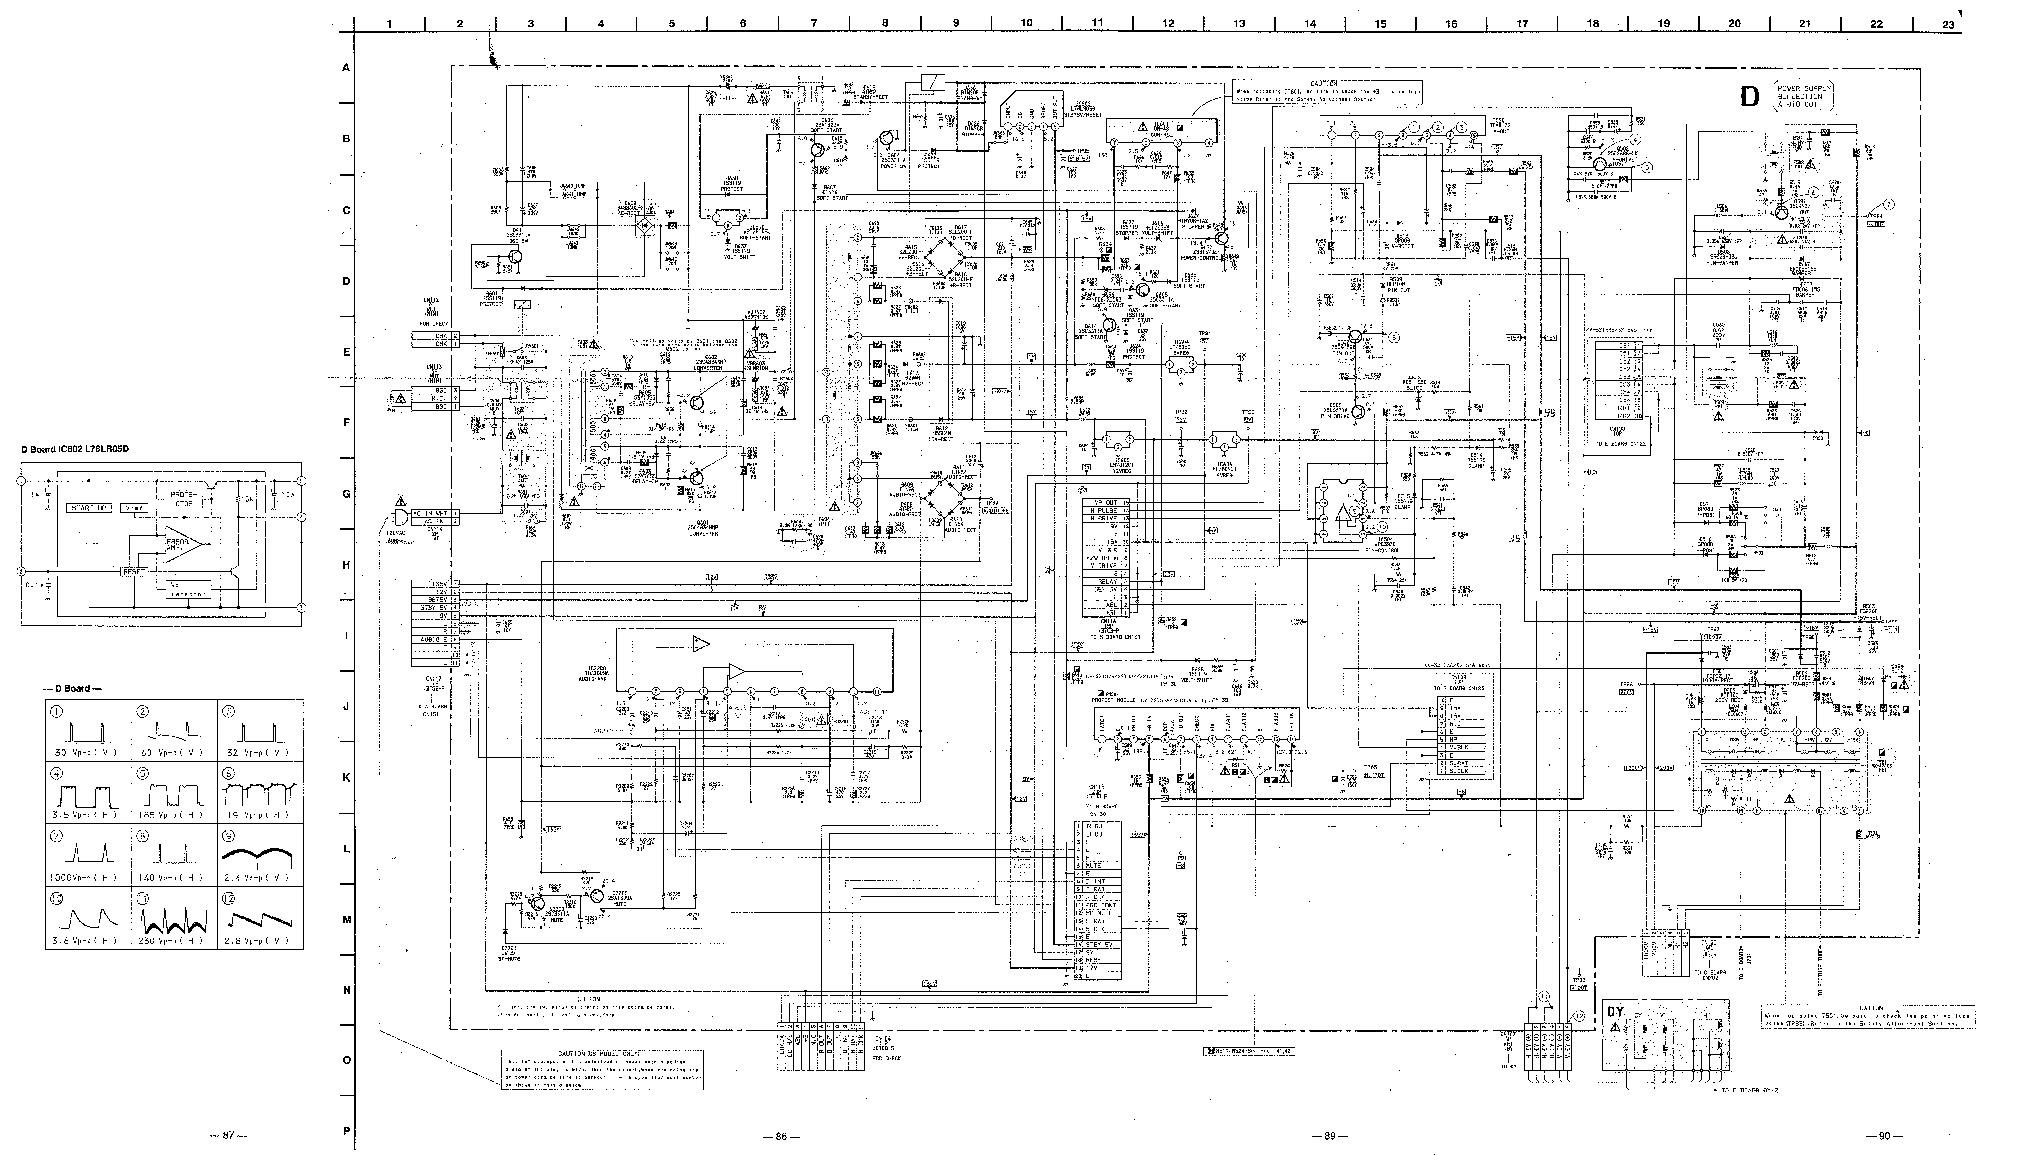 TV KV2970M FUENTE.pdf